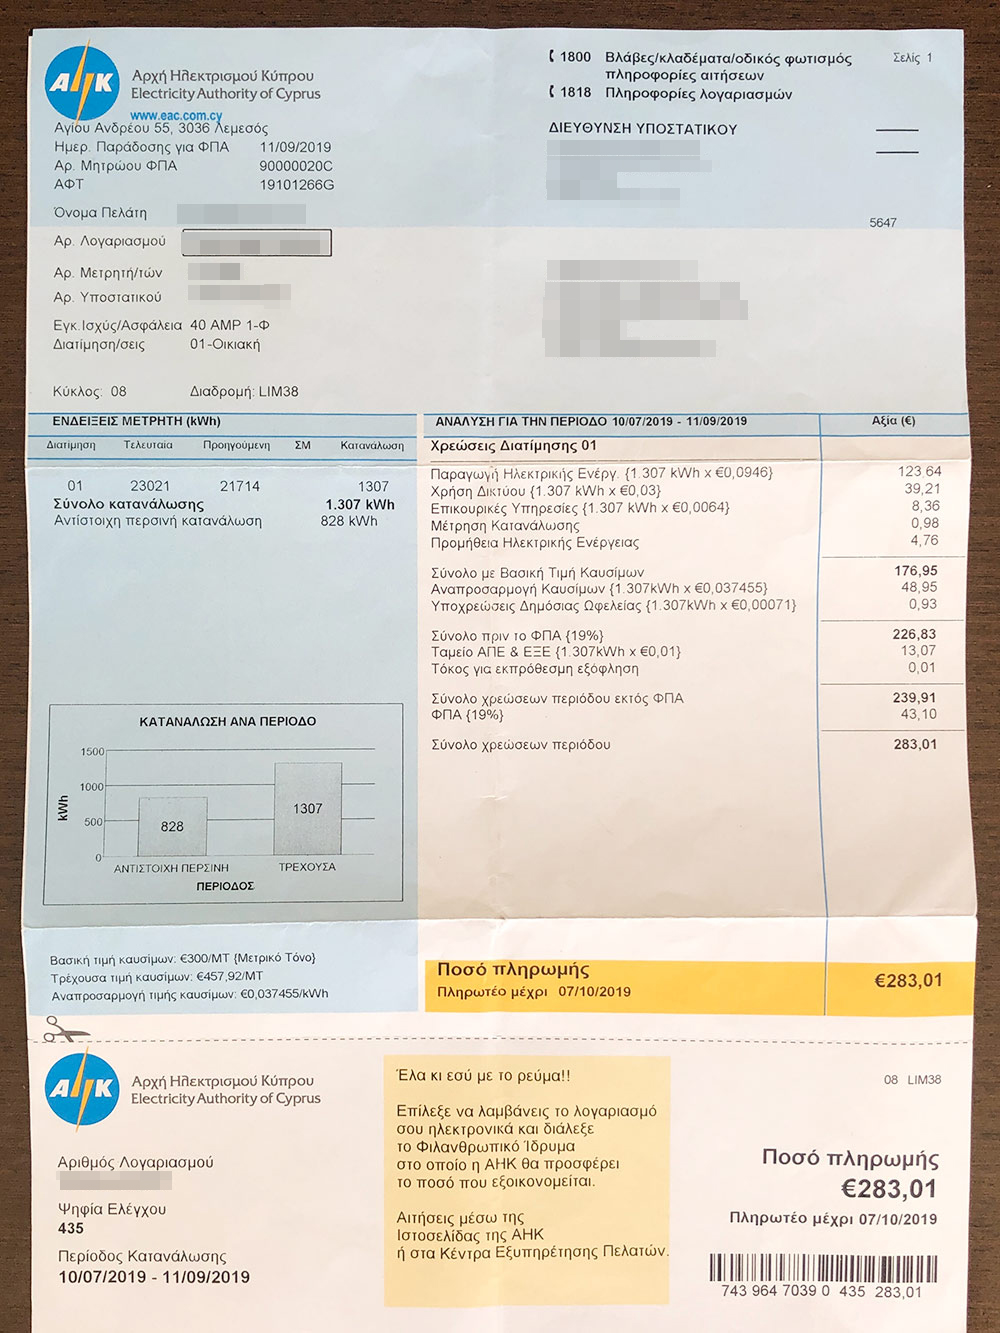 Наш максимальный счет за электроэнергию за два месяца